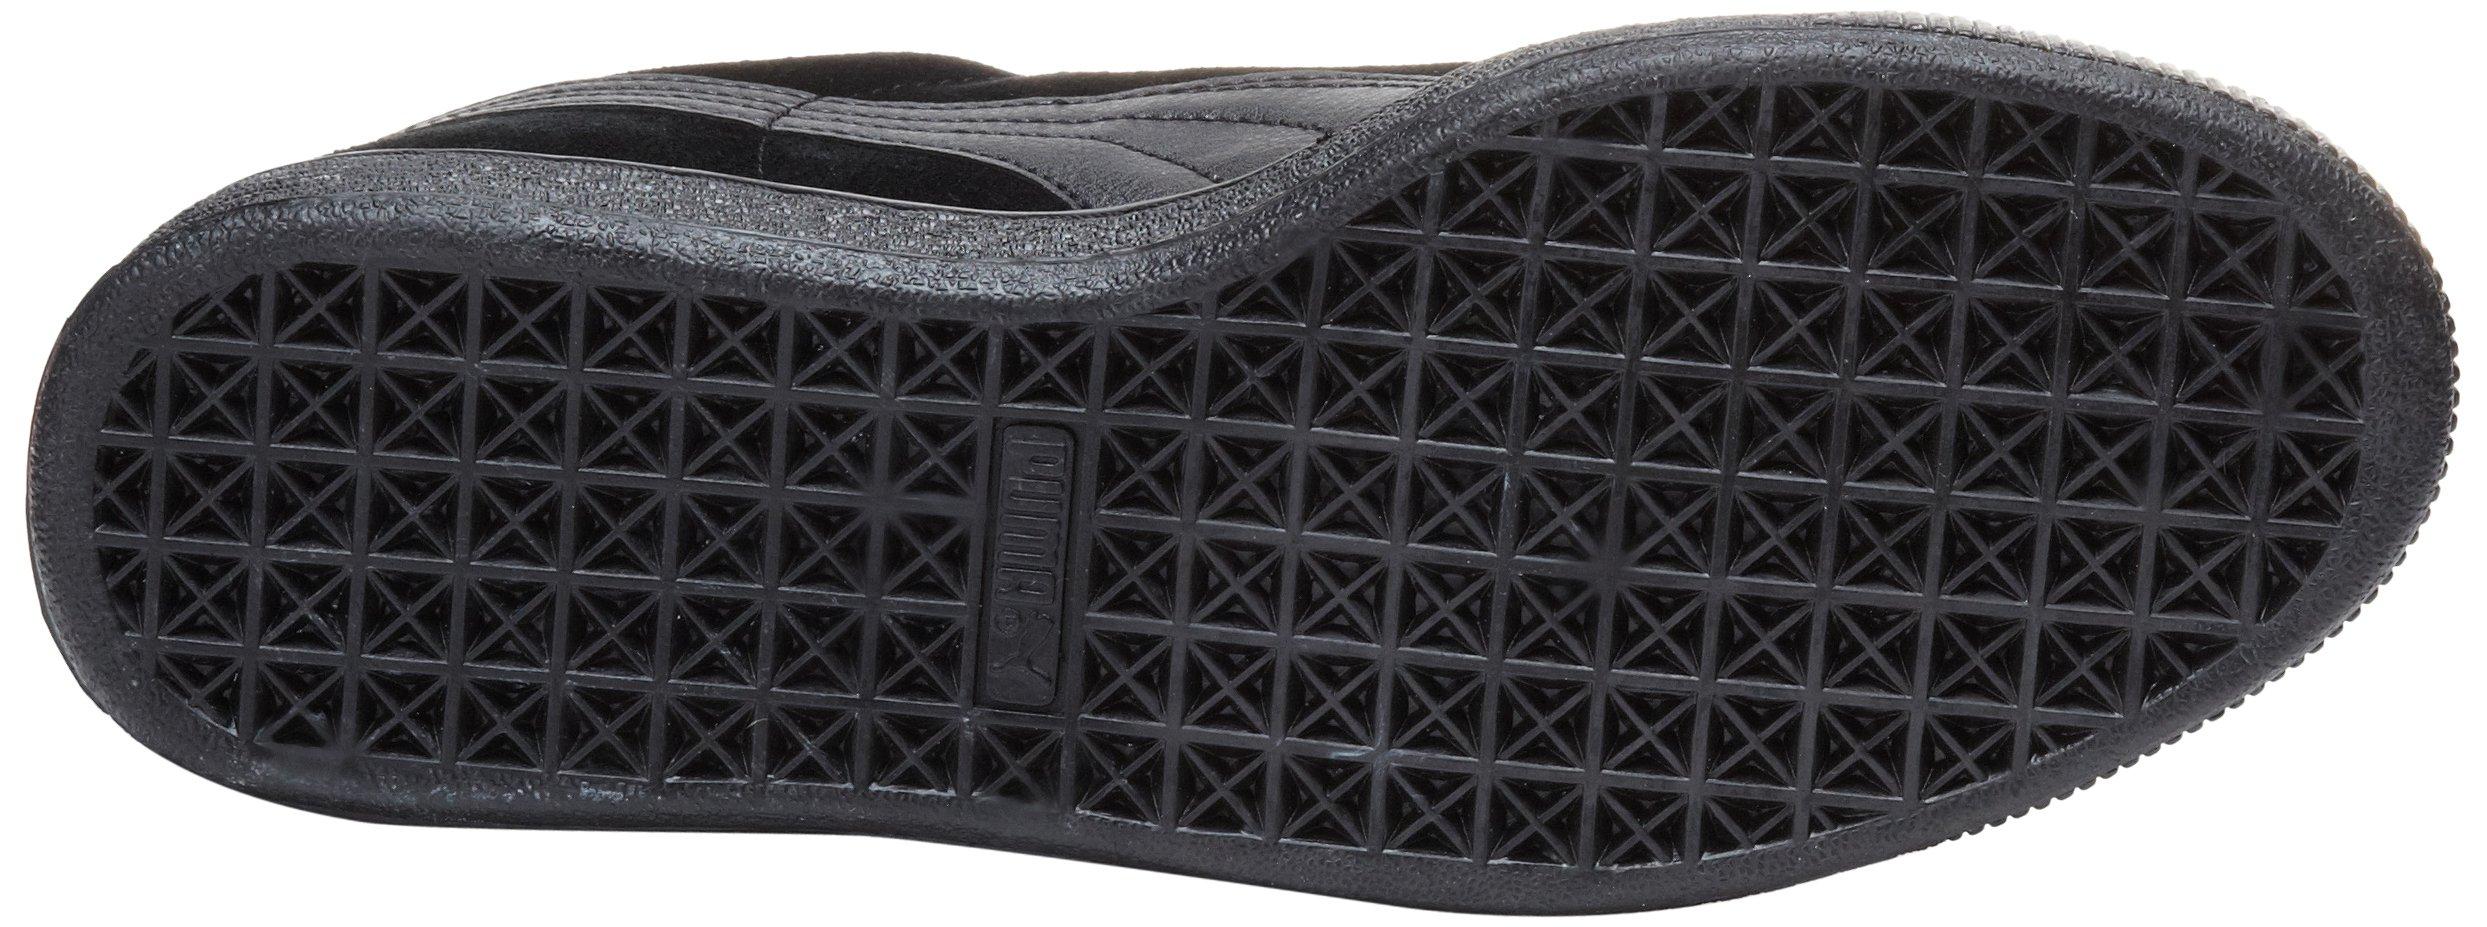 PUMA Suede Classic Leather Formstrip Sneaker,Black/Black,9 D(M) US